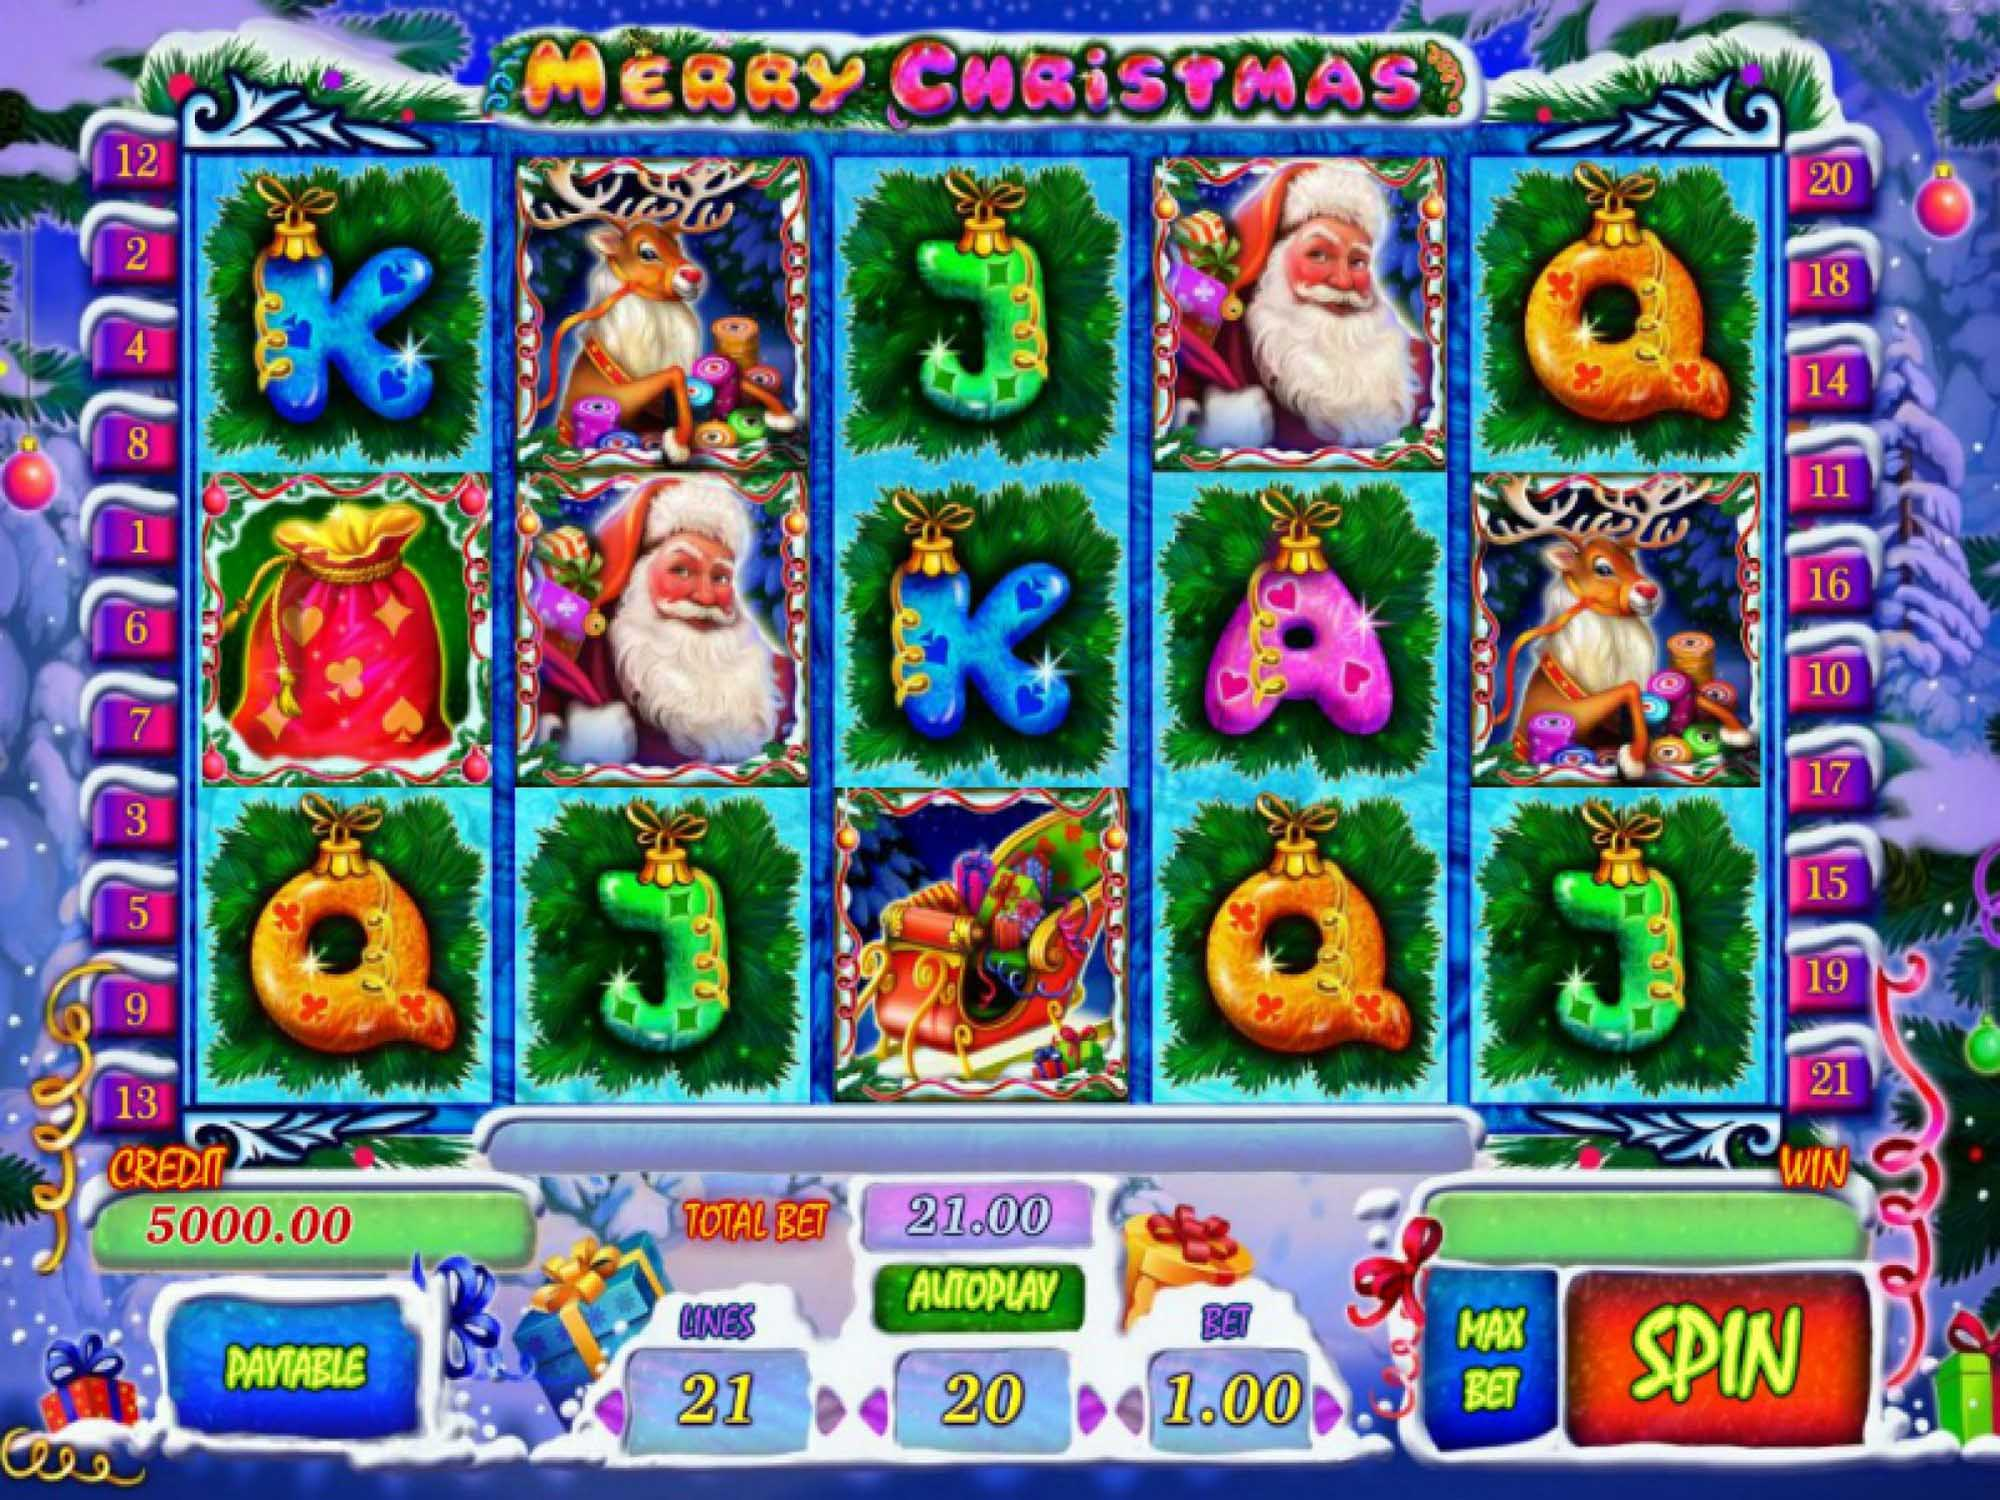 Merry Christmas Casino Slot